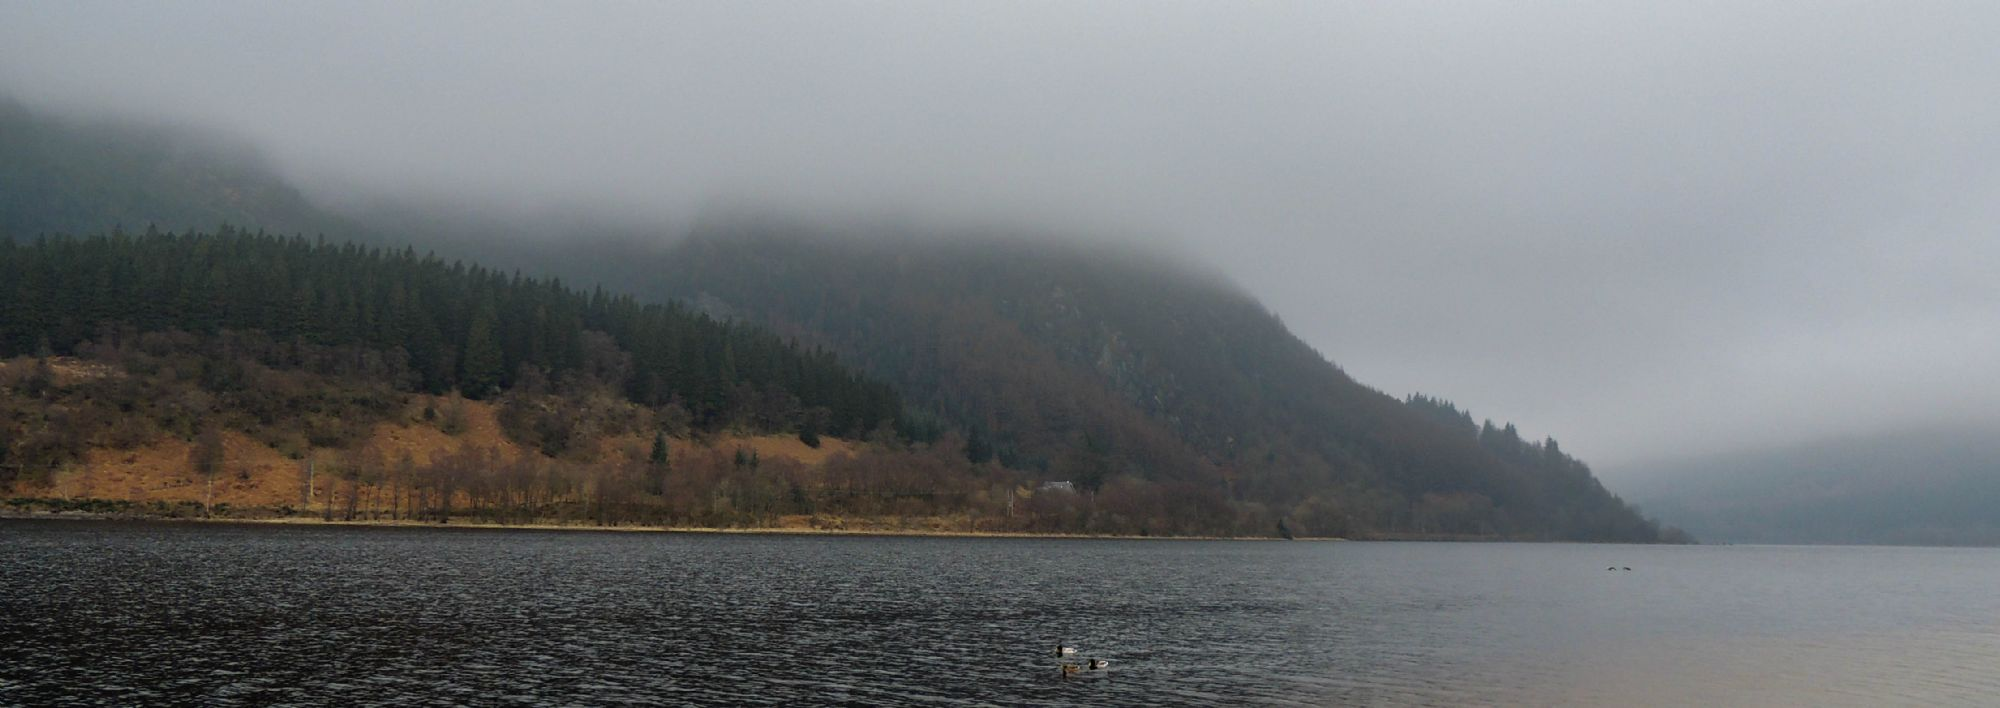 Loch Lomond in the clouds